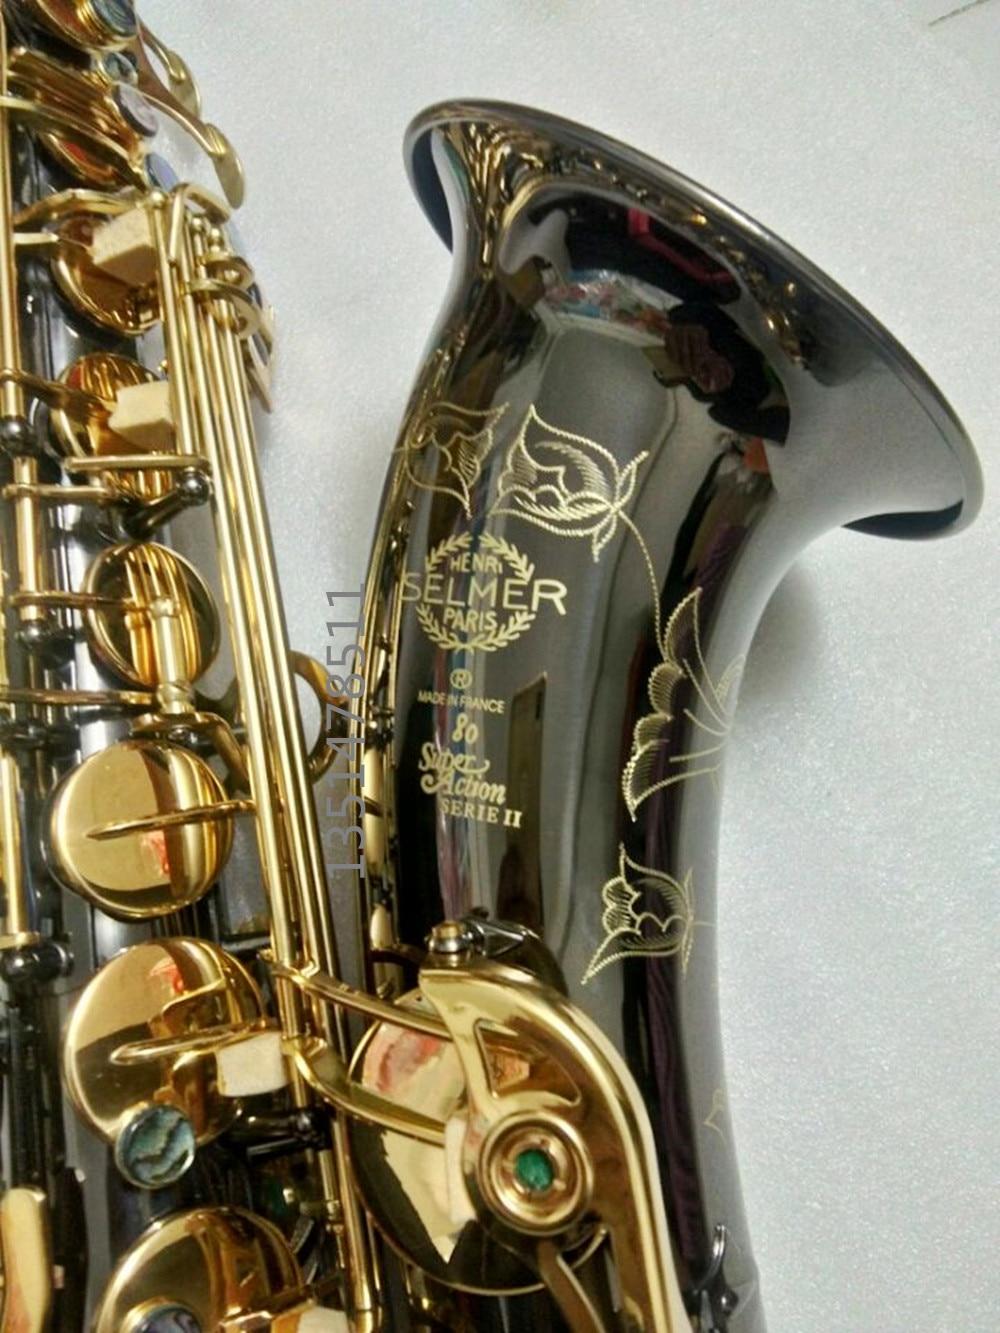 tenor saxophone instrumentnew SELMER 802 B tenor Sax instruments / wind / tube black nickel gold key saxophone e5cc rx2asm 802